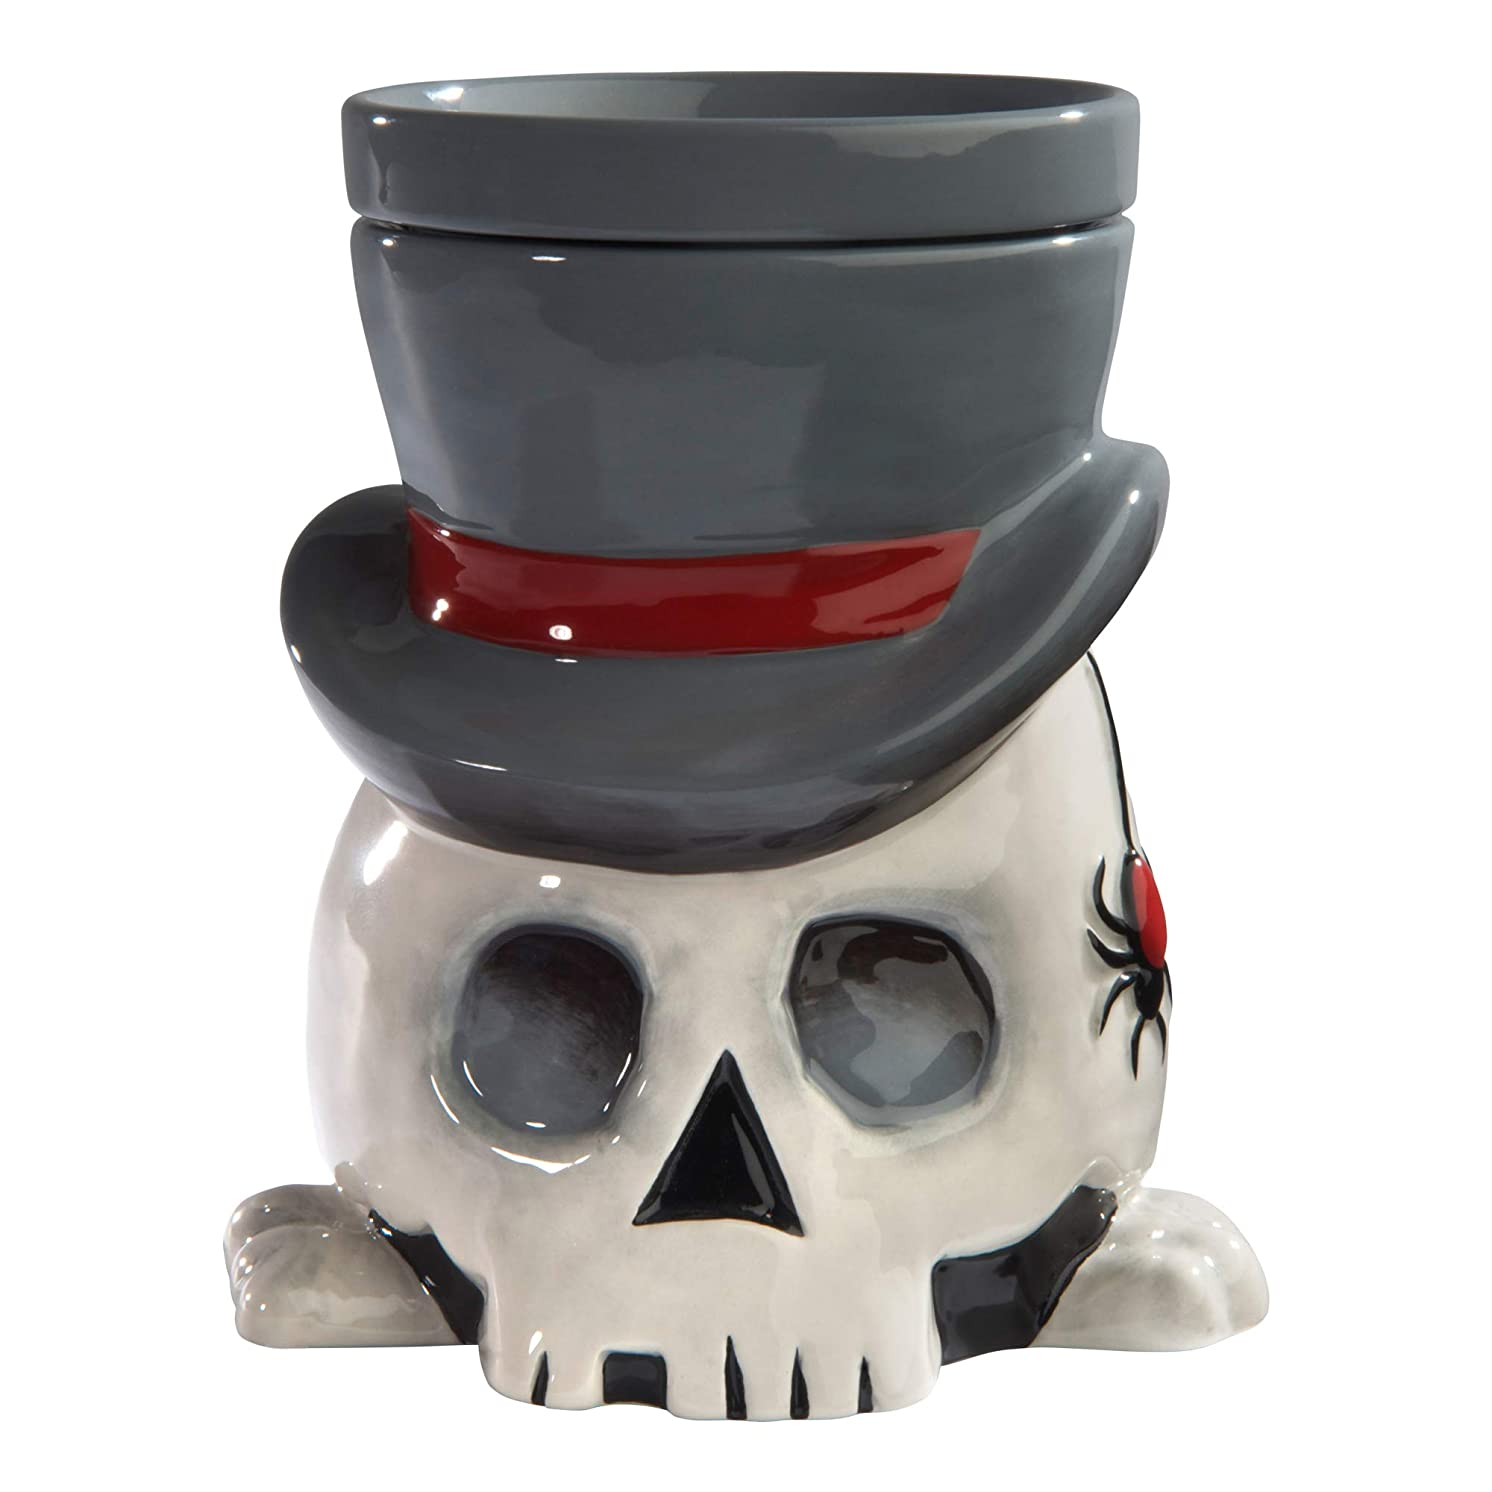 The Undertaker Horror Style Wax Warmer hjaaisbmzx6835